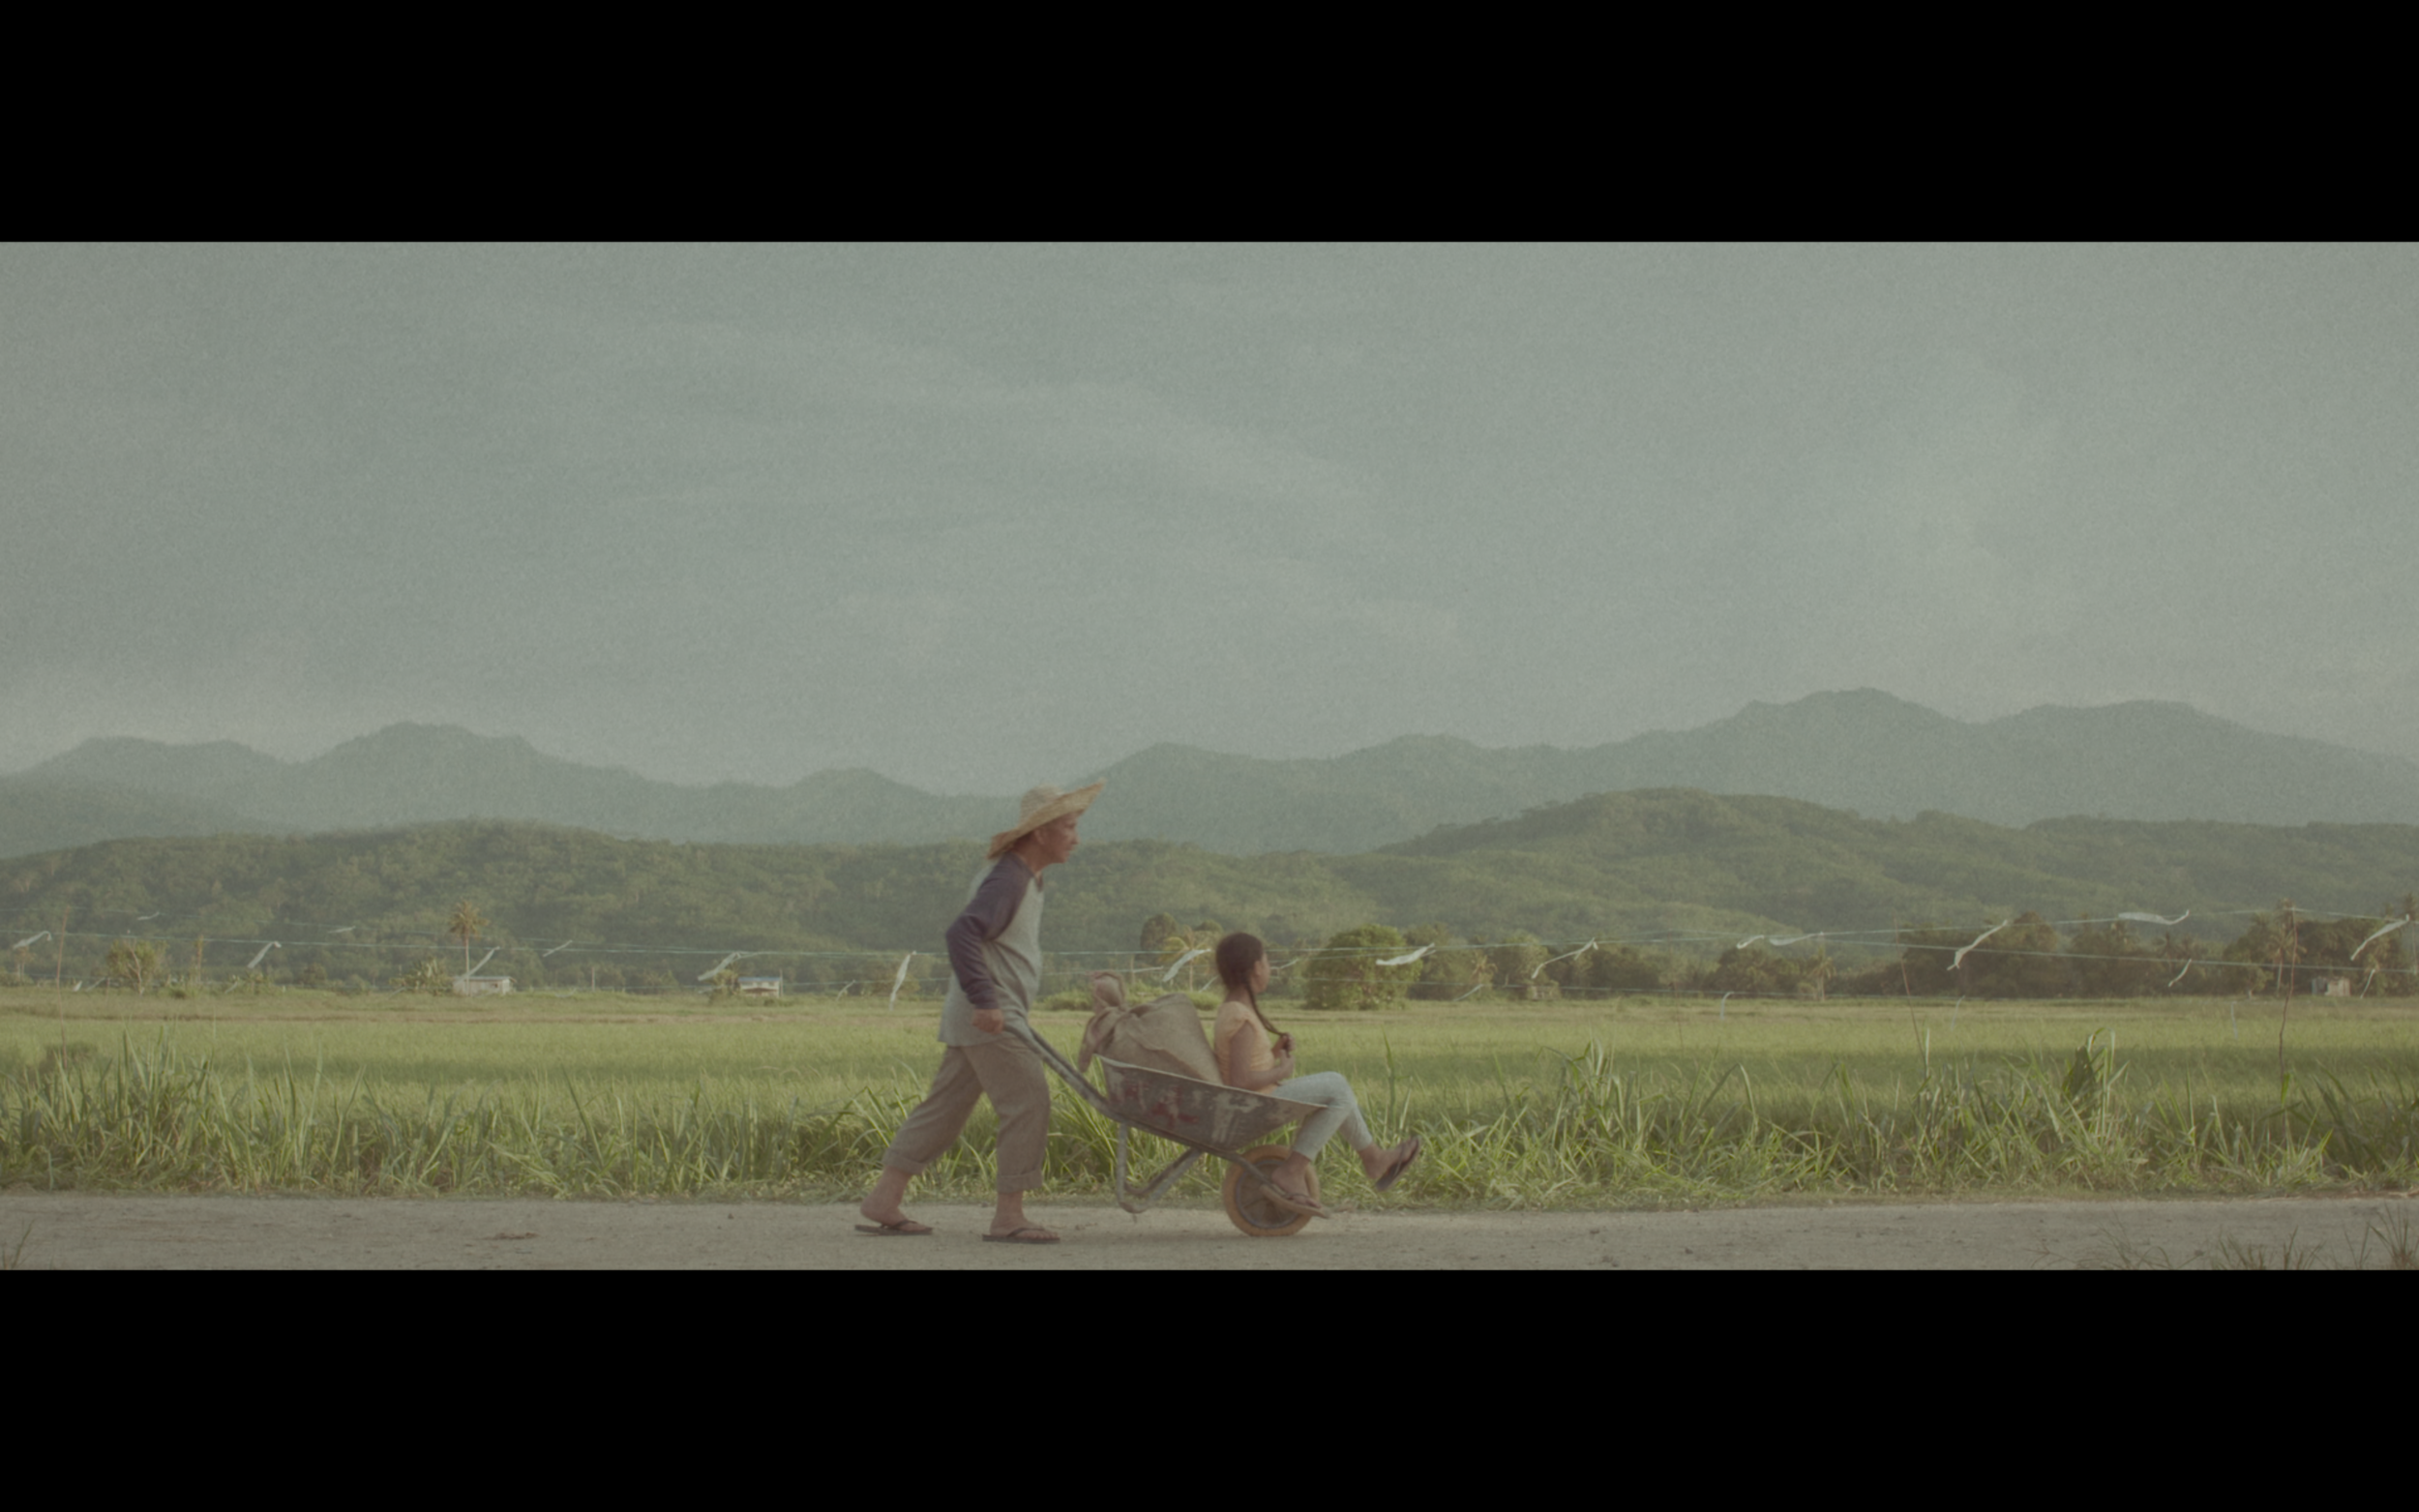 A scene from AirAsia Hari Kaamatan and Gawai video, 'A Girl Who Loves Rice.'